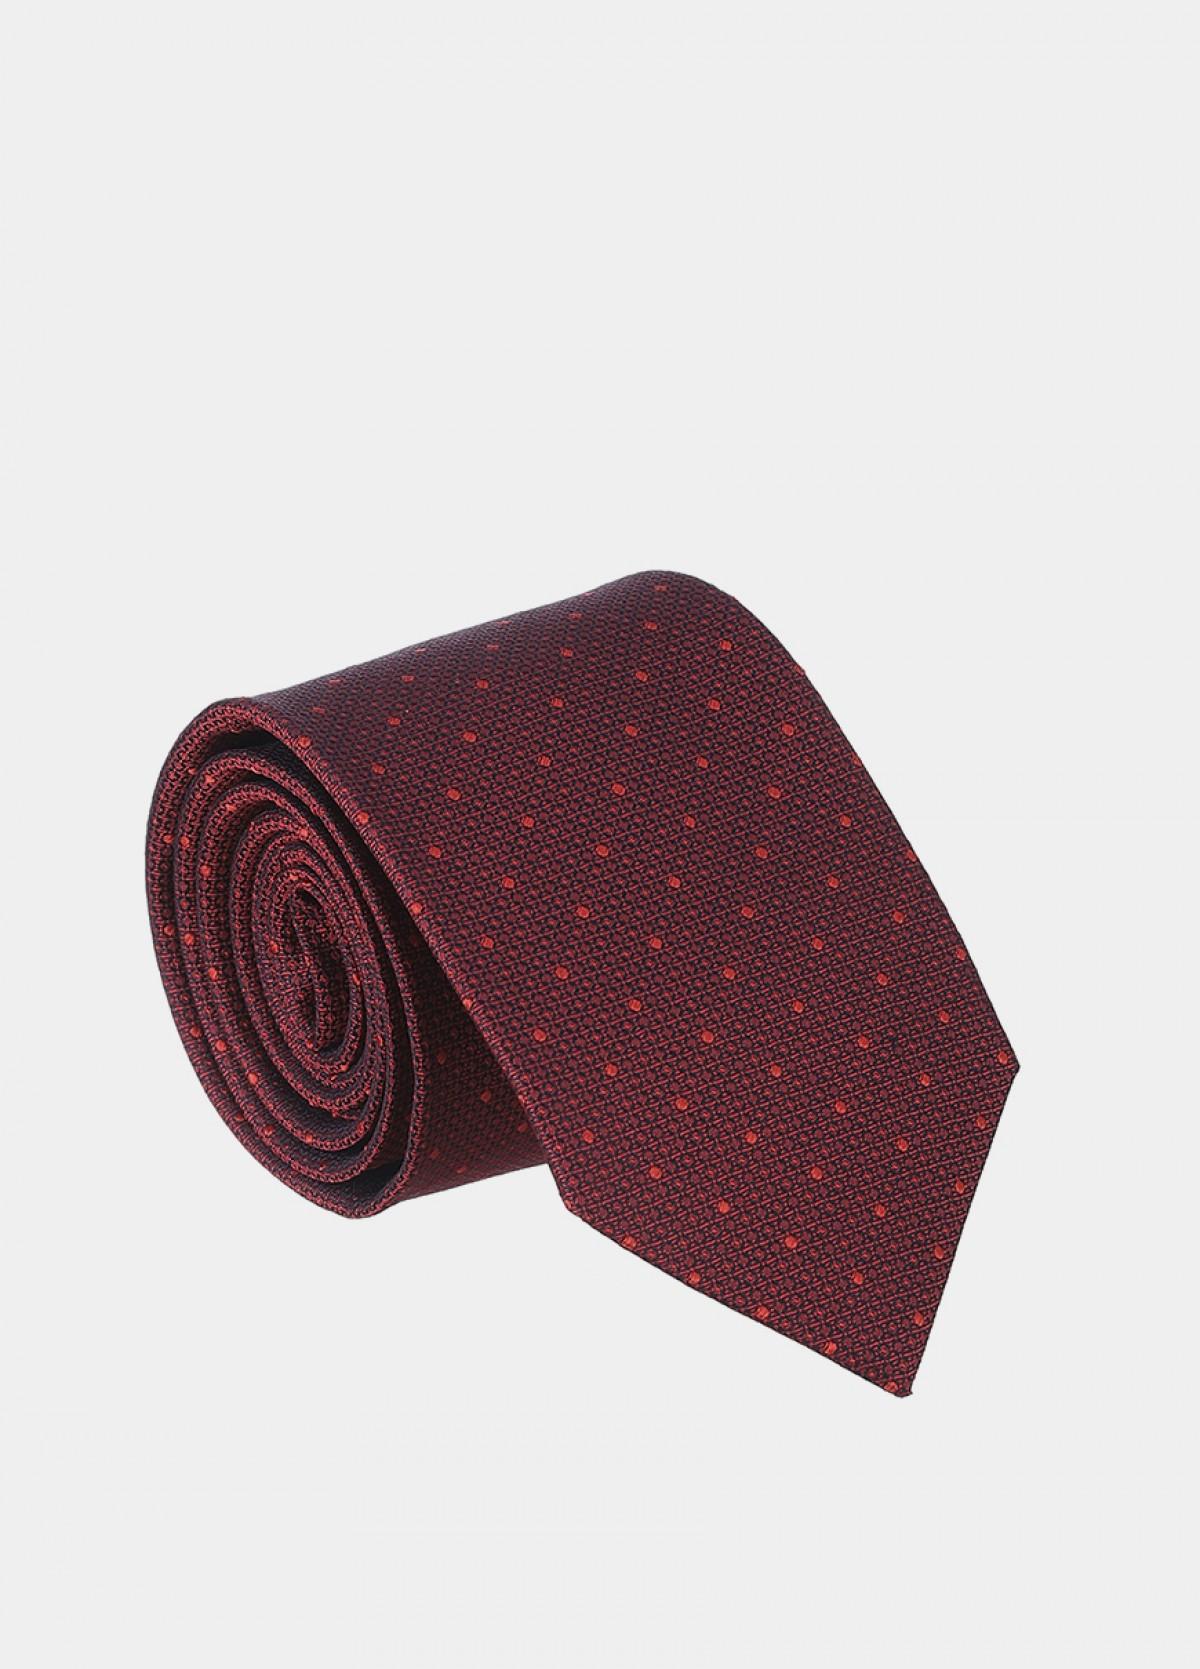 The Tie, Cufflink & Pocket Square Gift Set